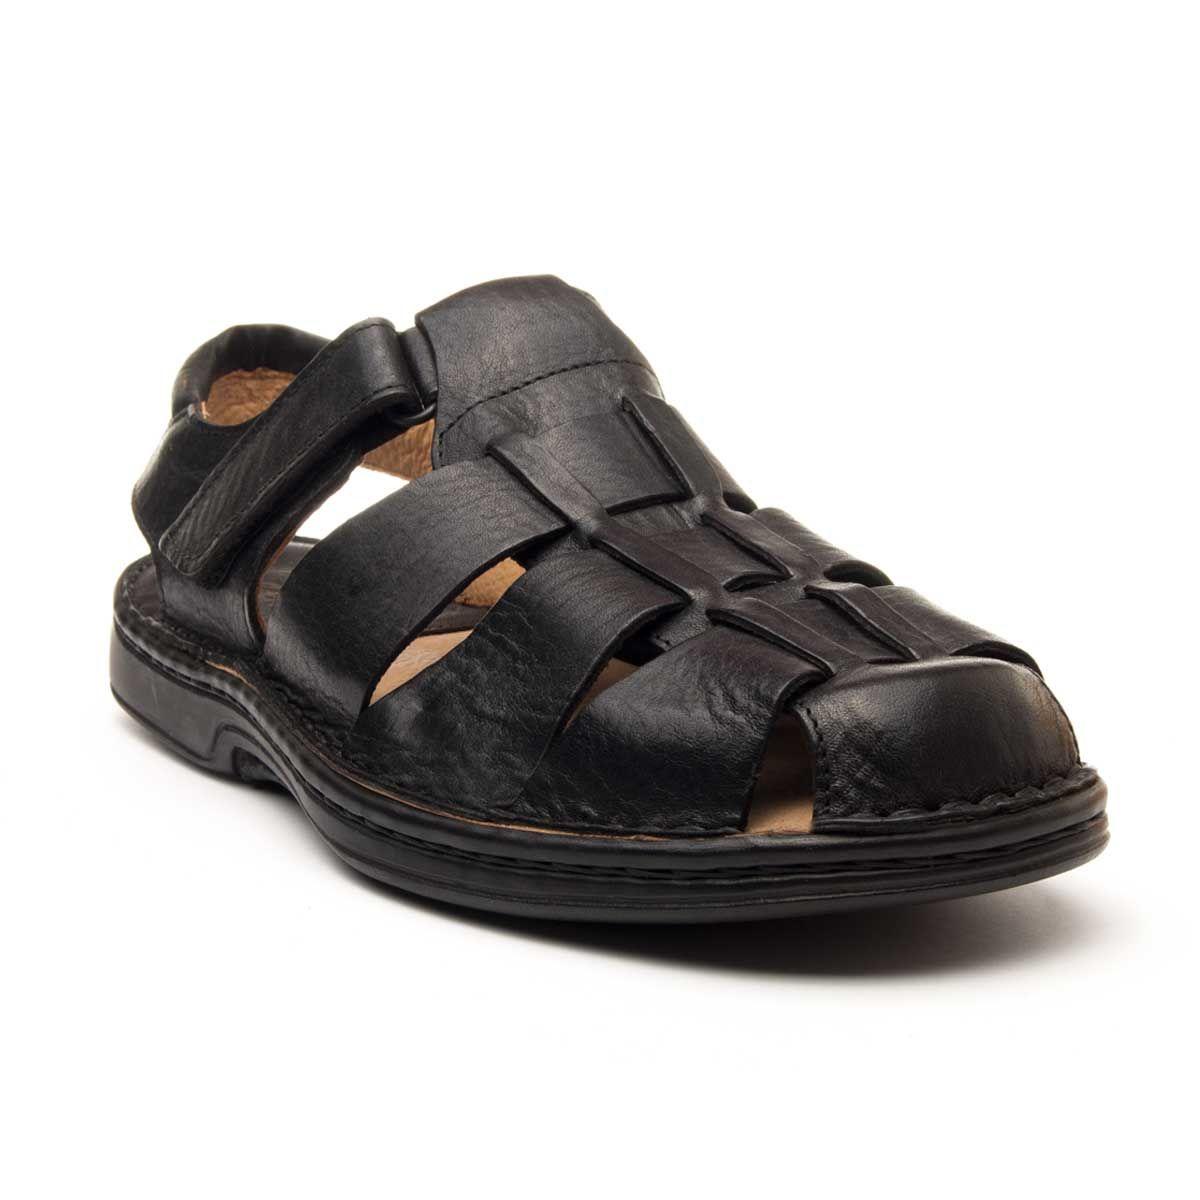 Purapiel Comfortable Sandal in Black